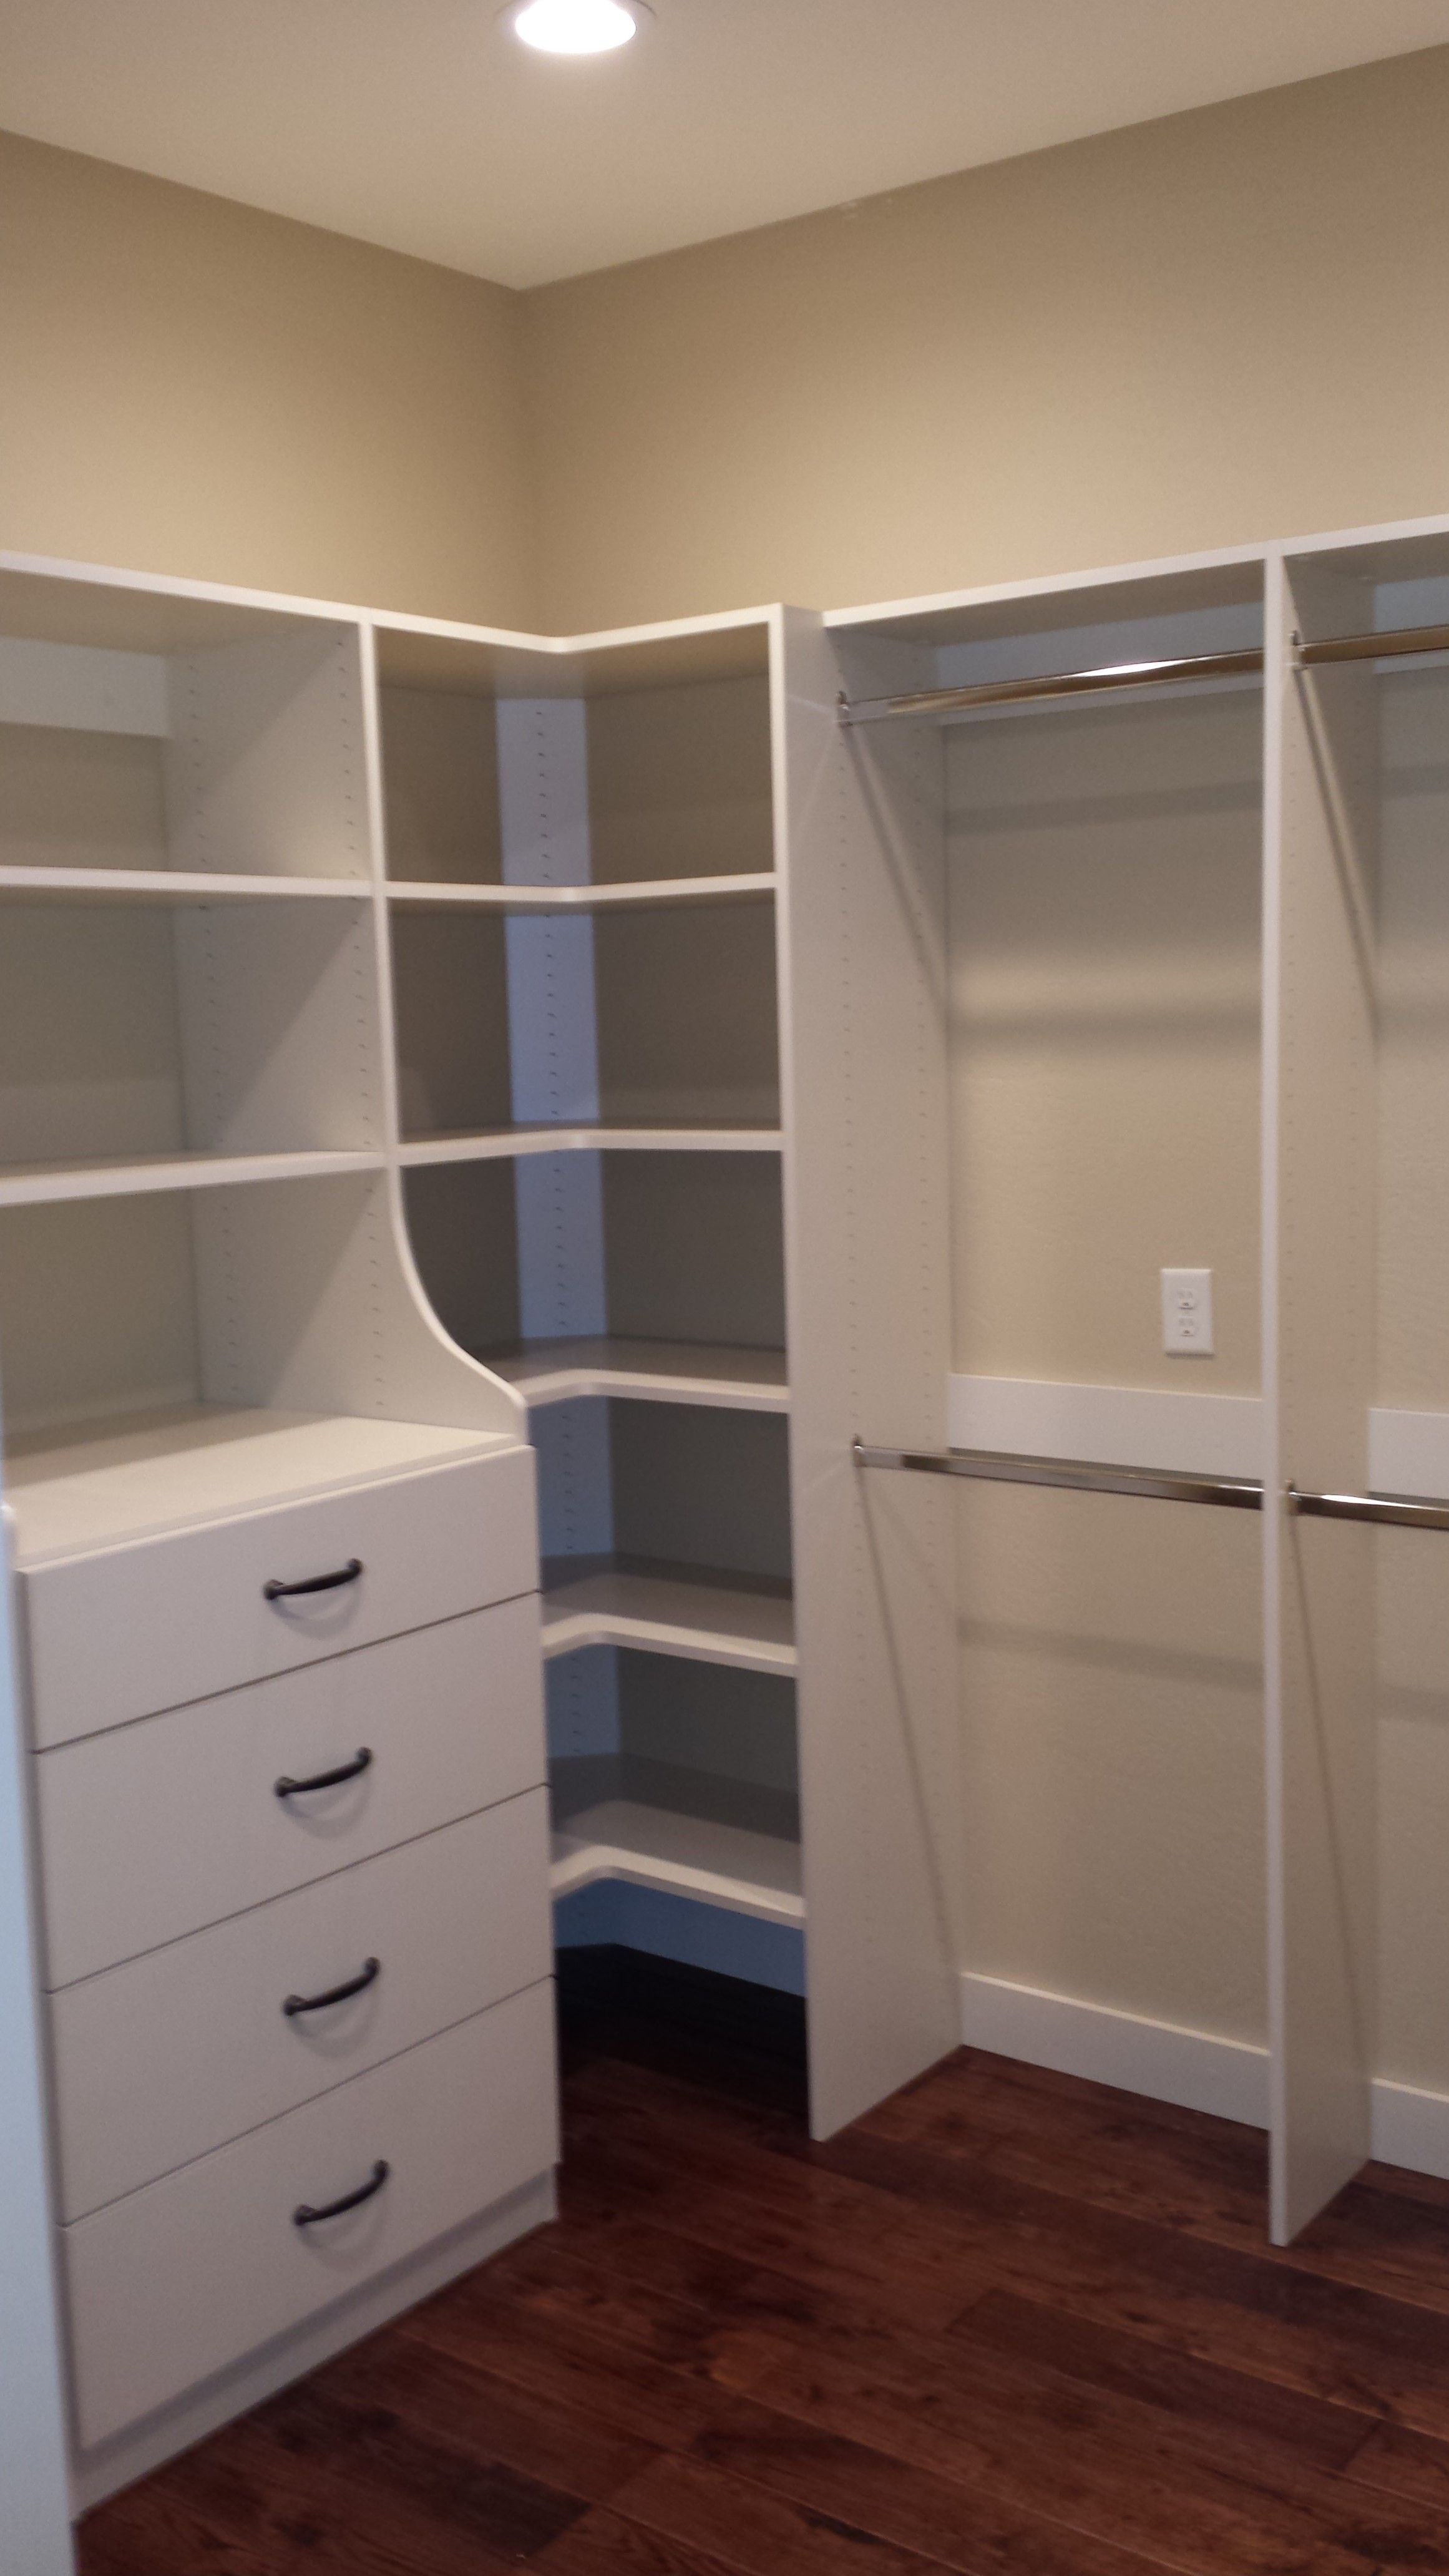 Wood Drawer Units For Closets Best Closet Organization Closet Layout Closet Designs